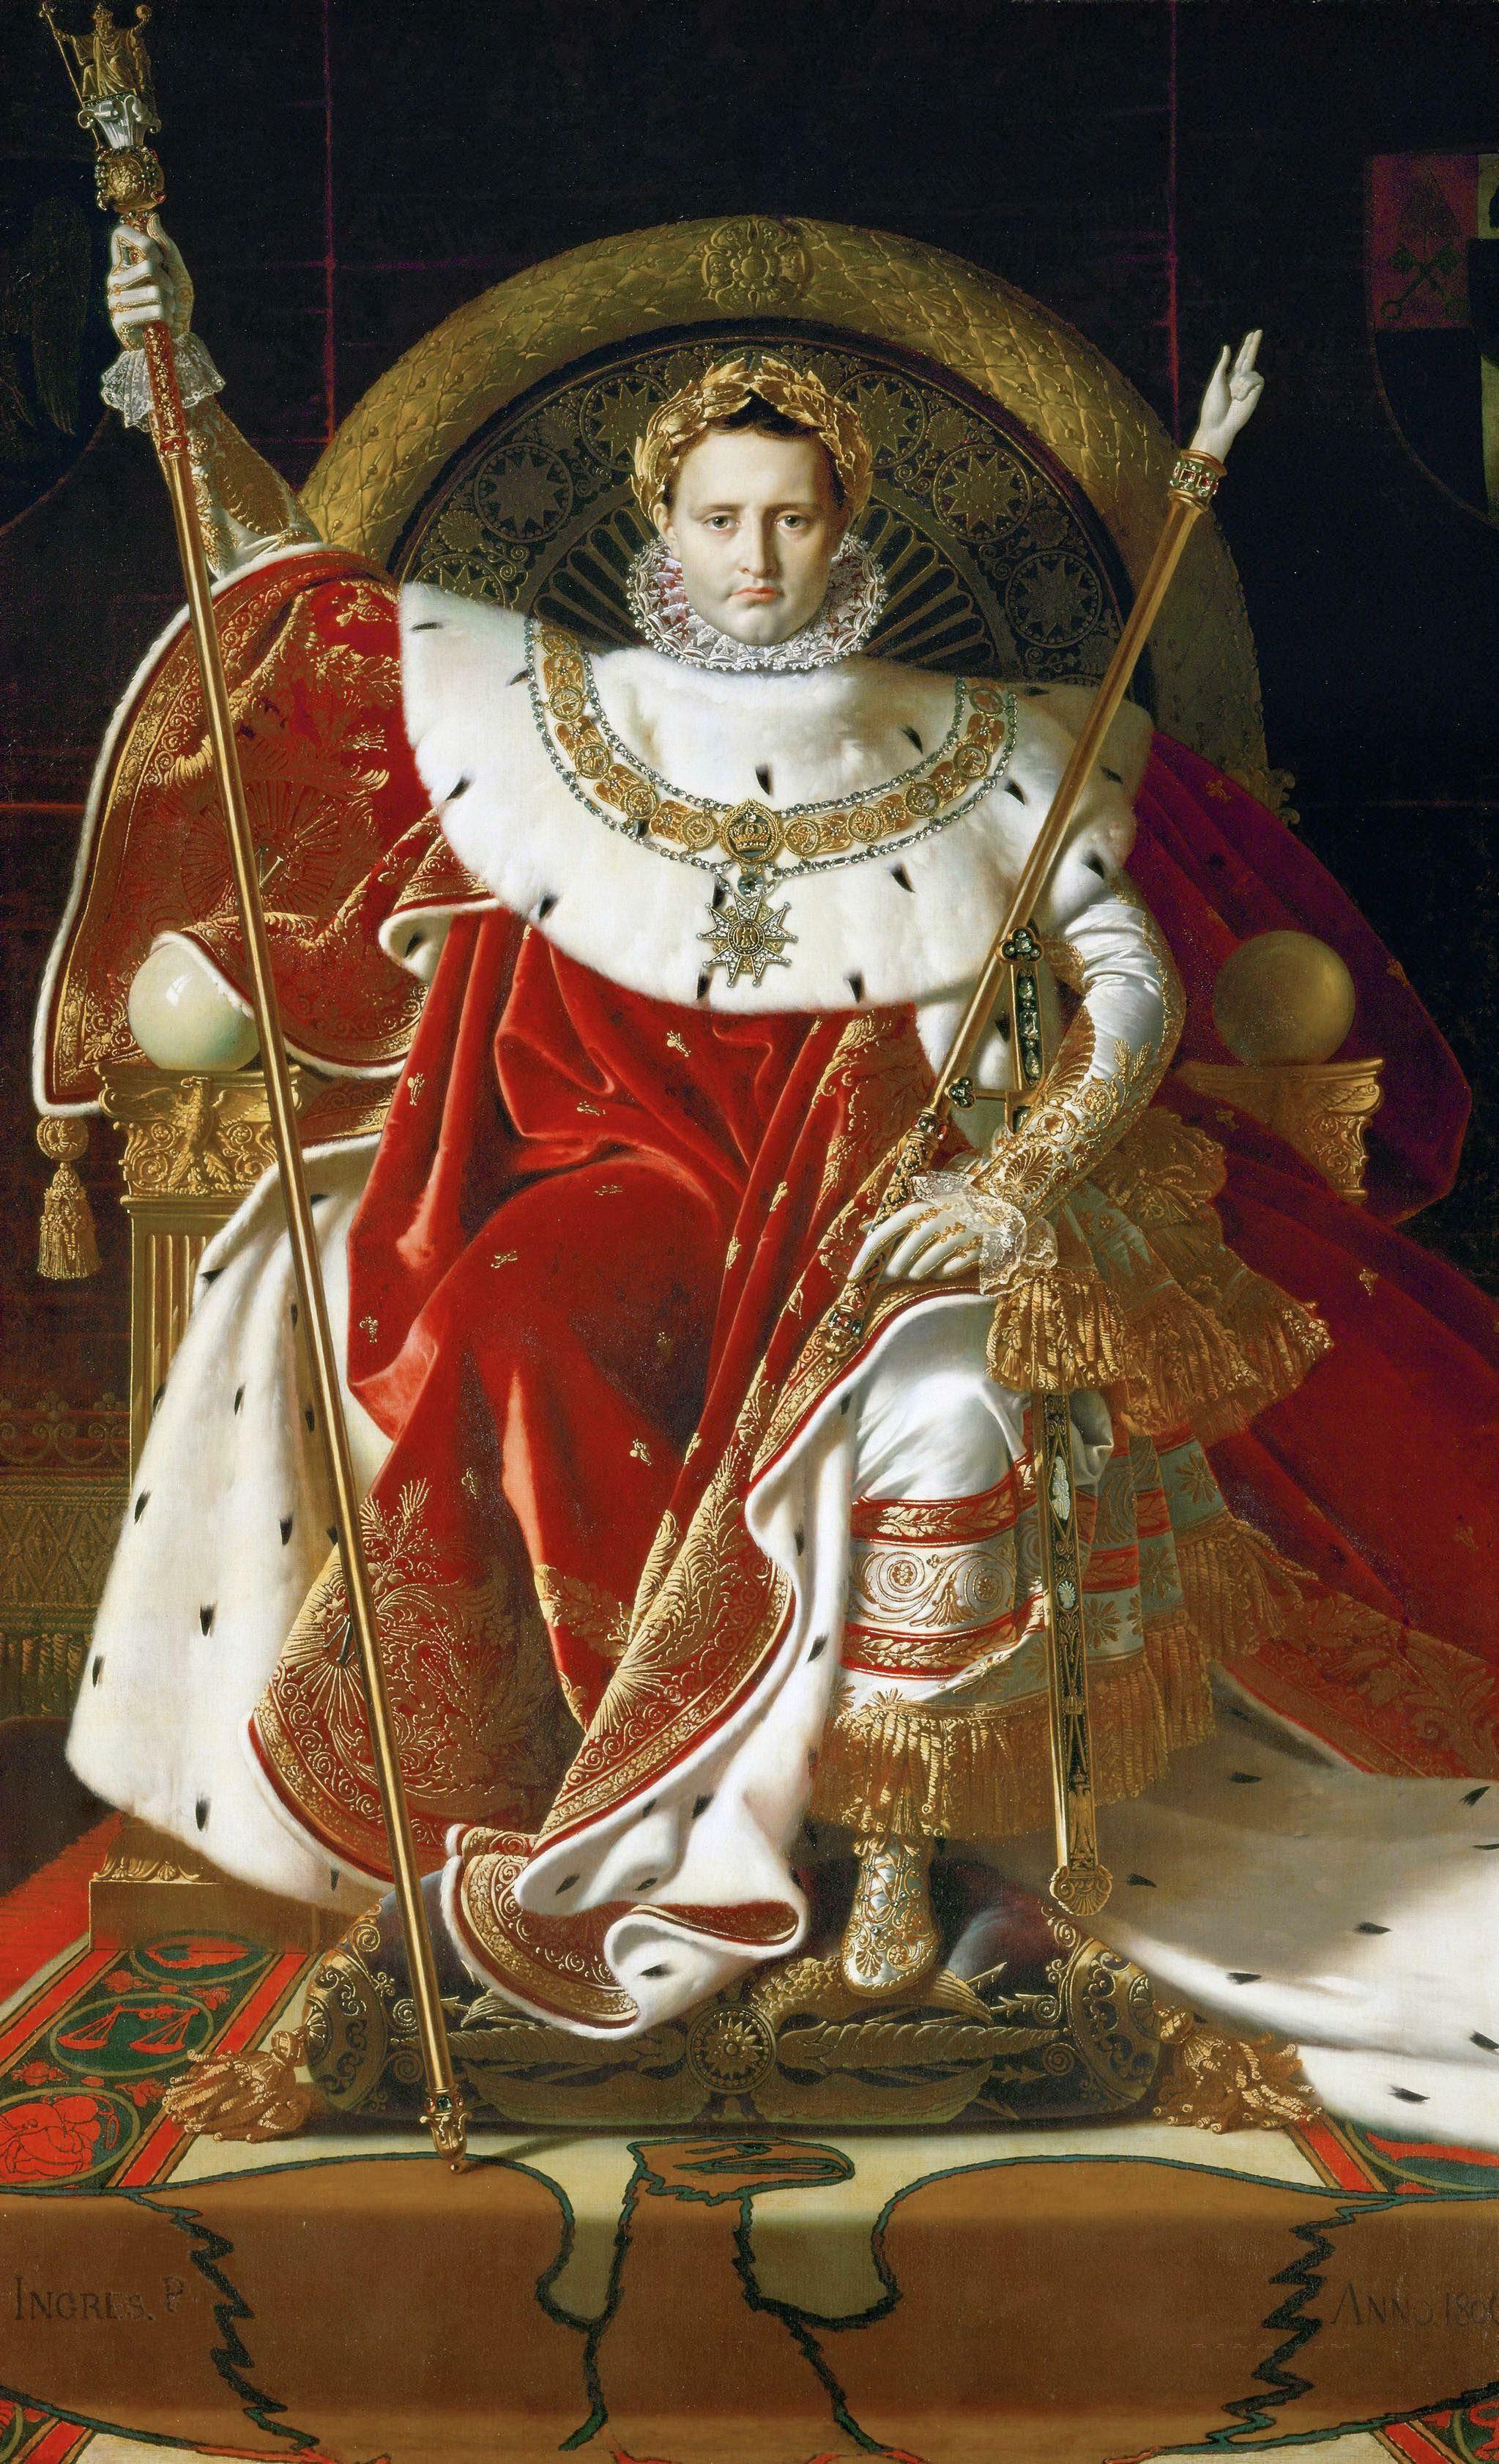 Jean Auguste Dominique Ingres: Napoleon on his Imperial throne